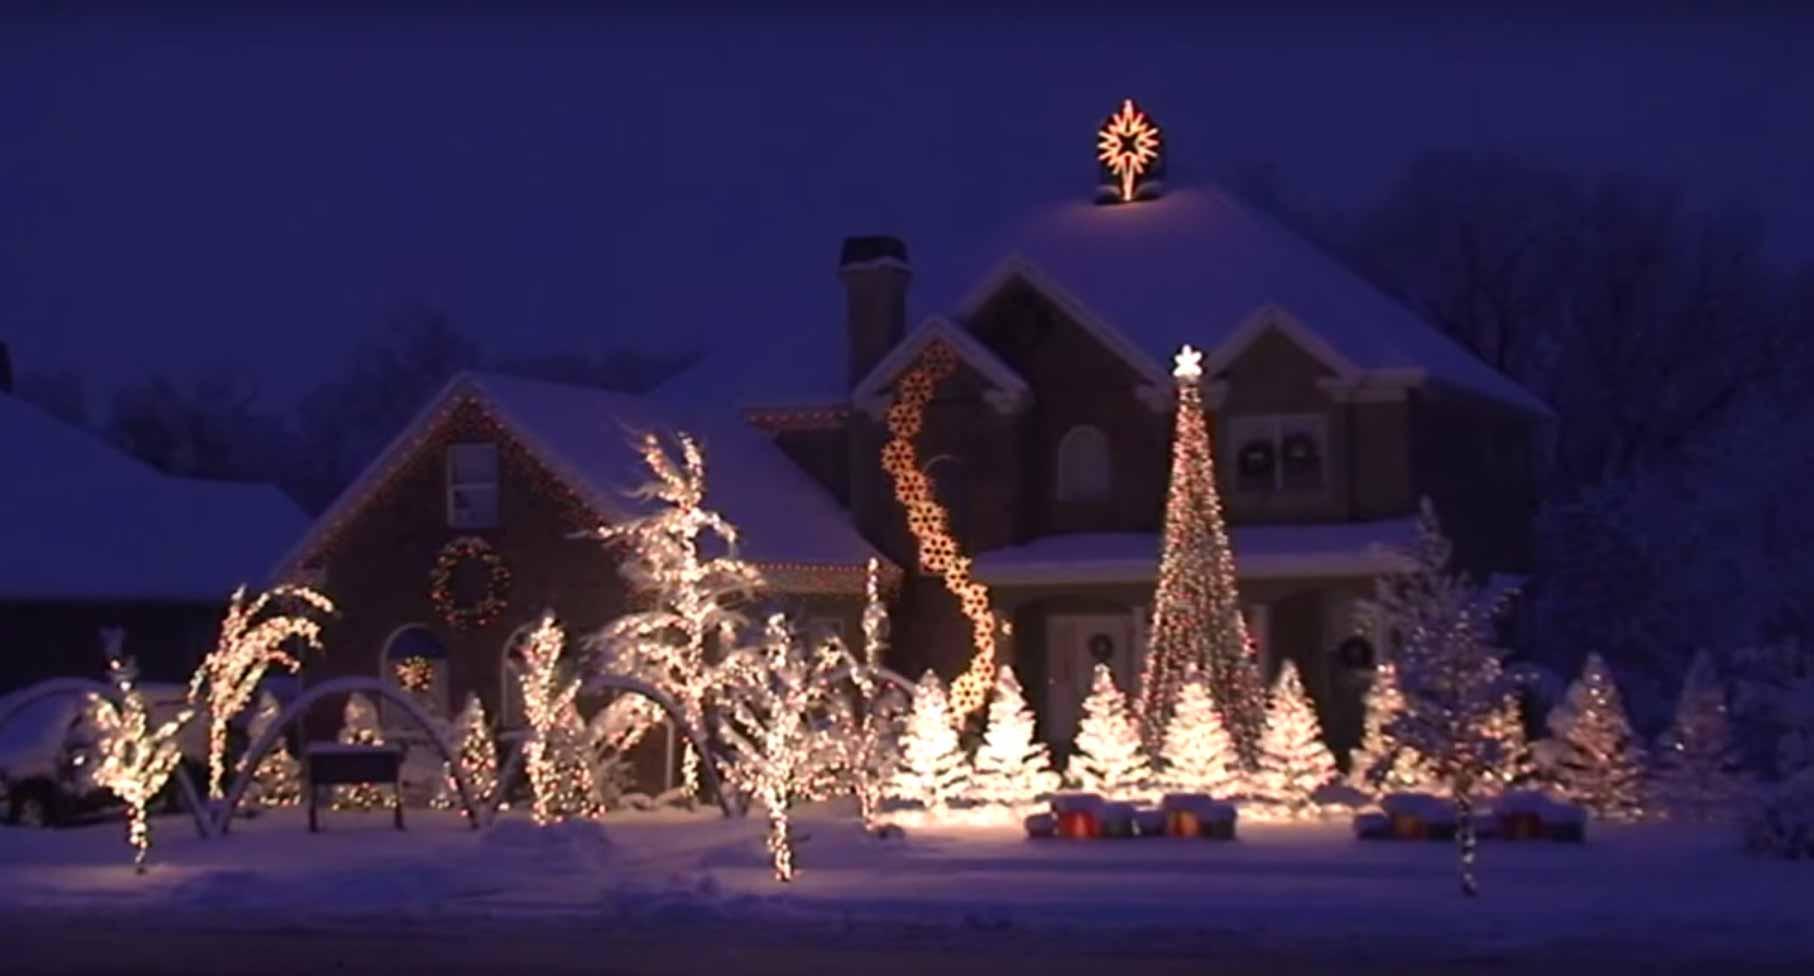 Christmas Lighting Videos  Best Christmas Lights Display